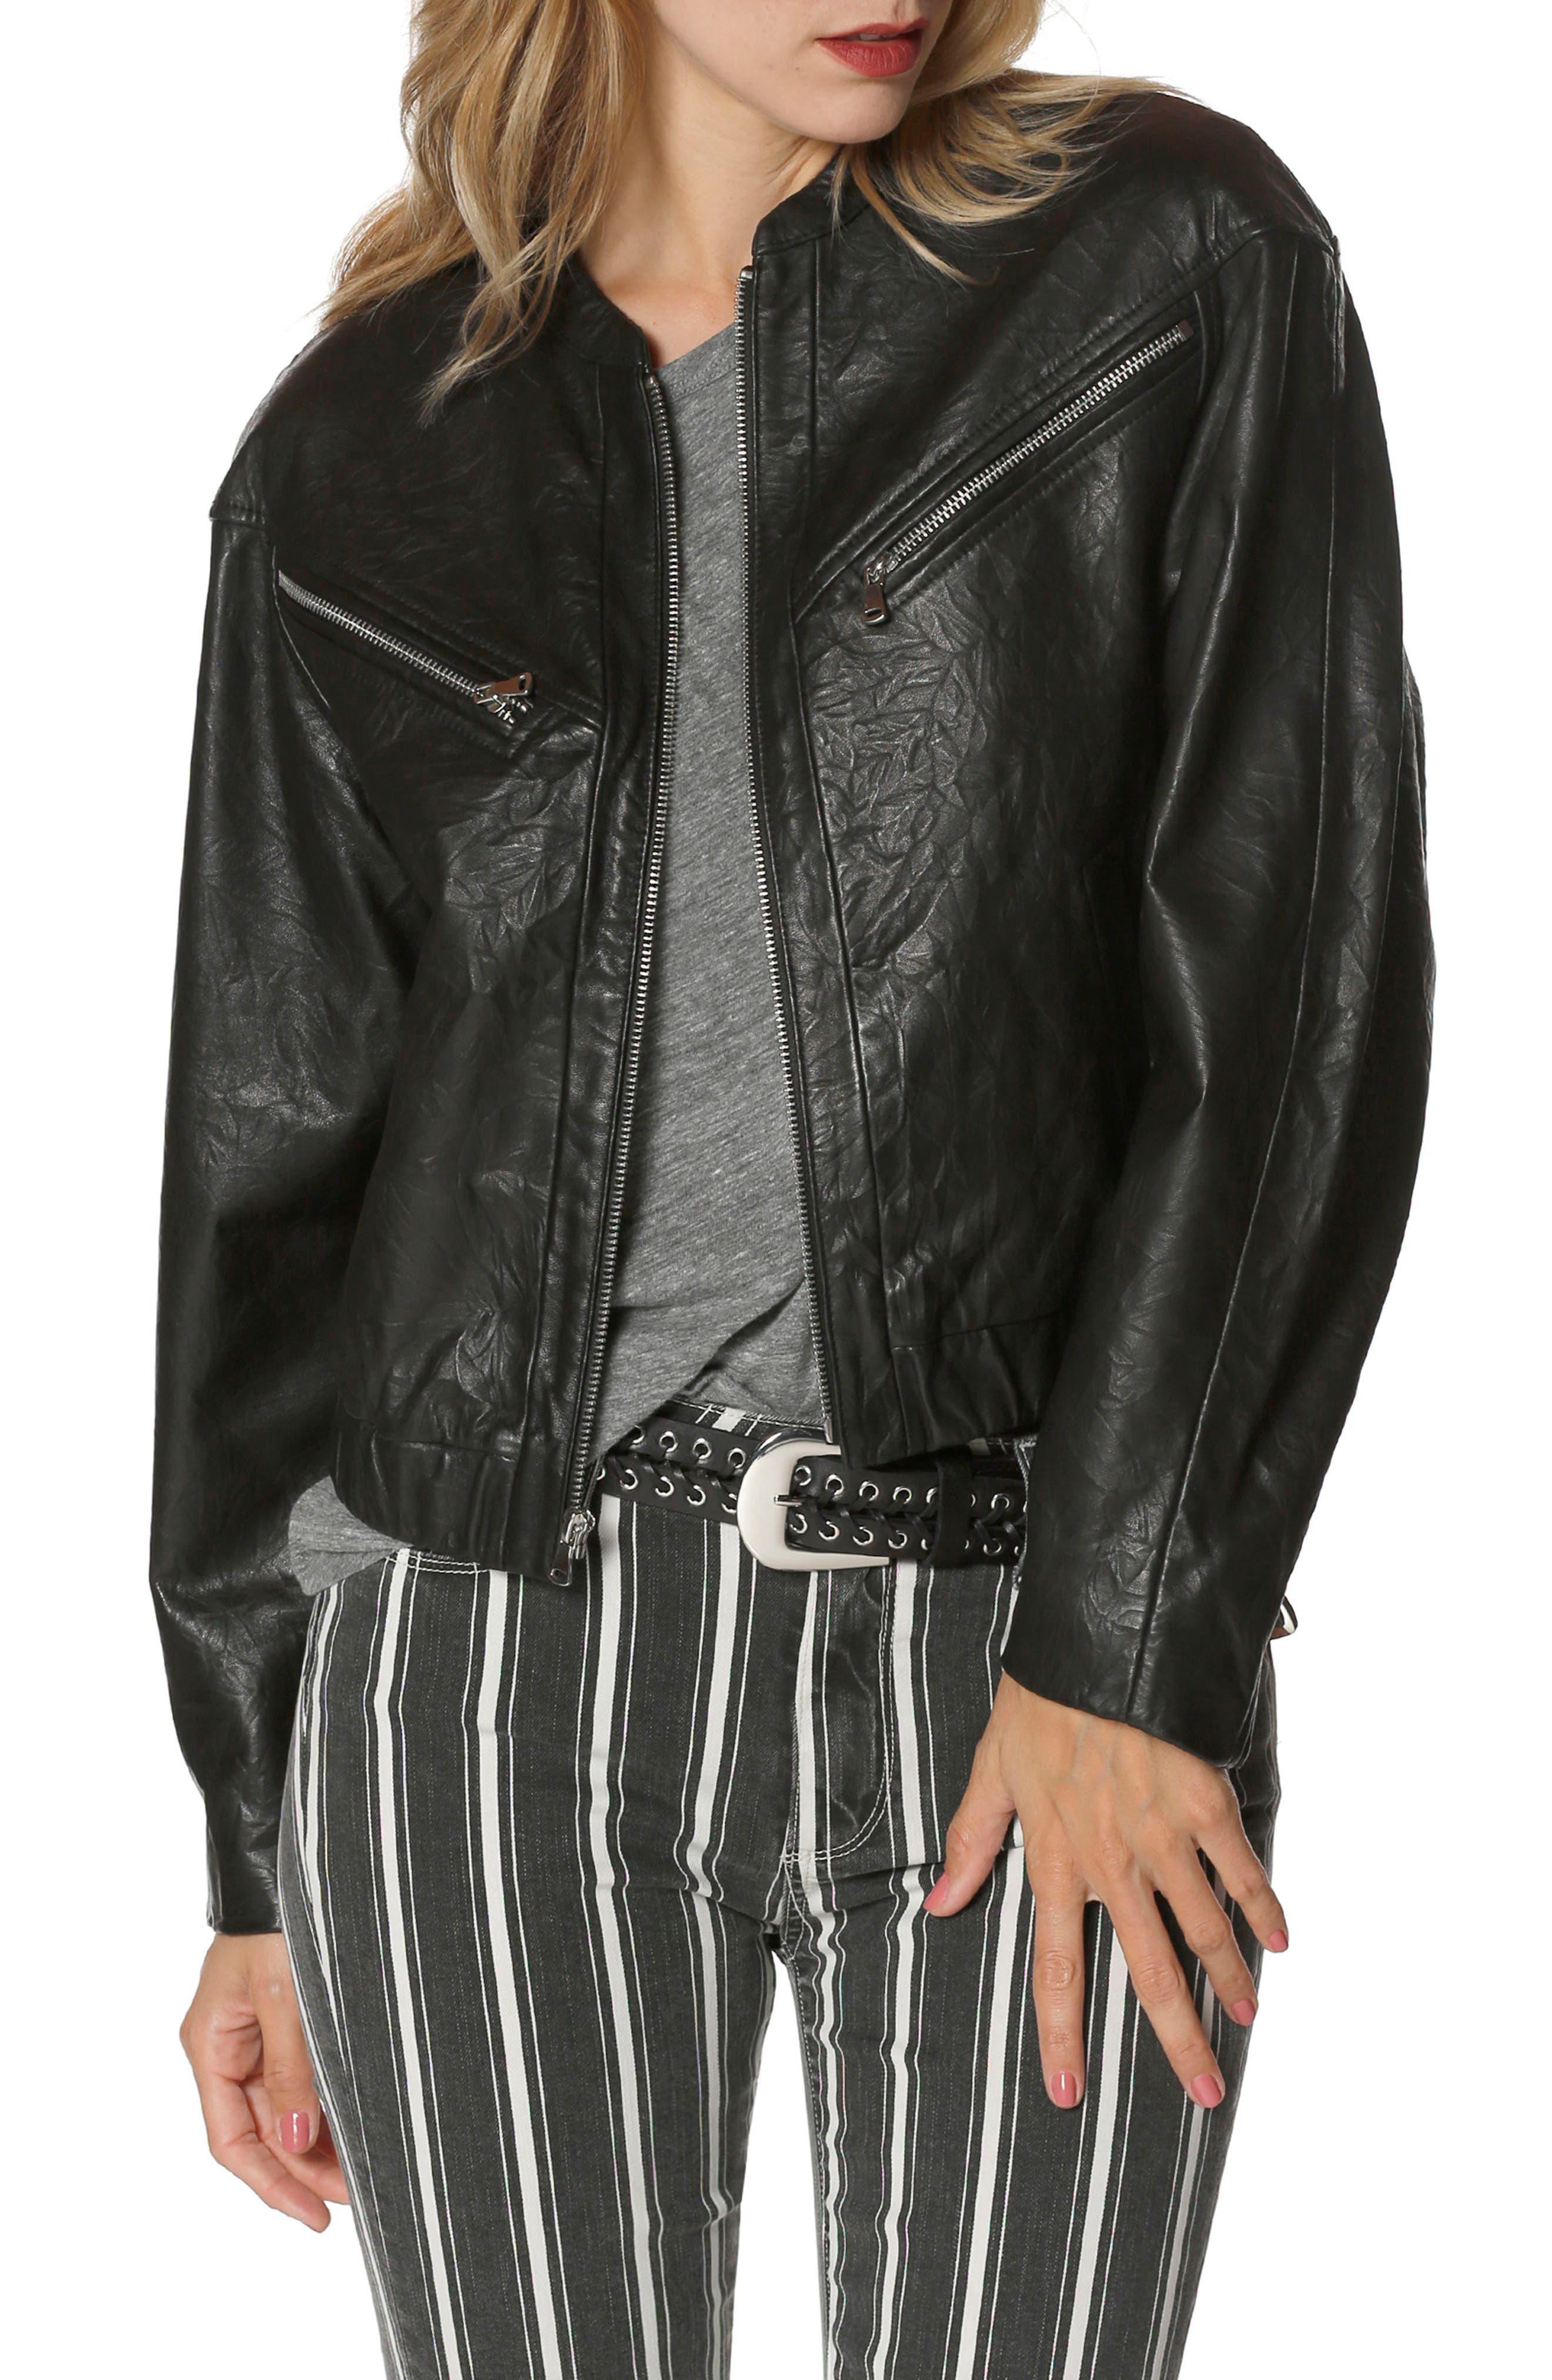 Giana Leather Moto Jacket,                             Main thumbnail 1, color,